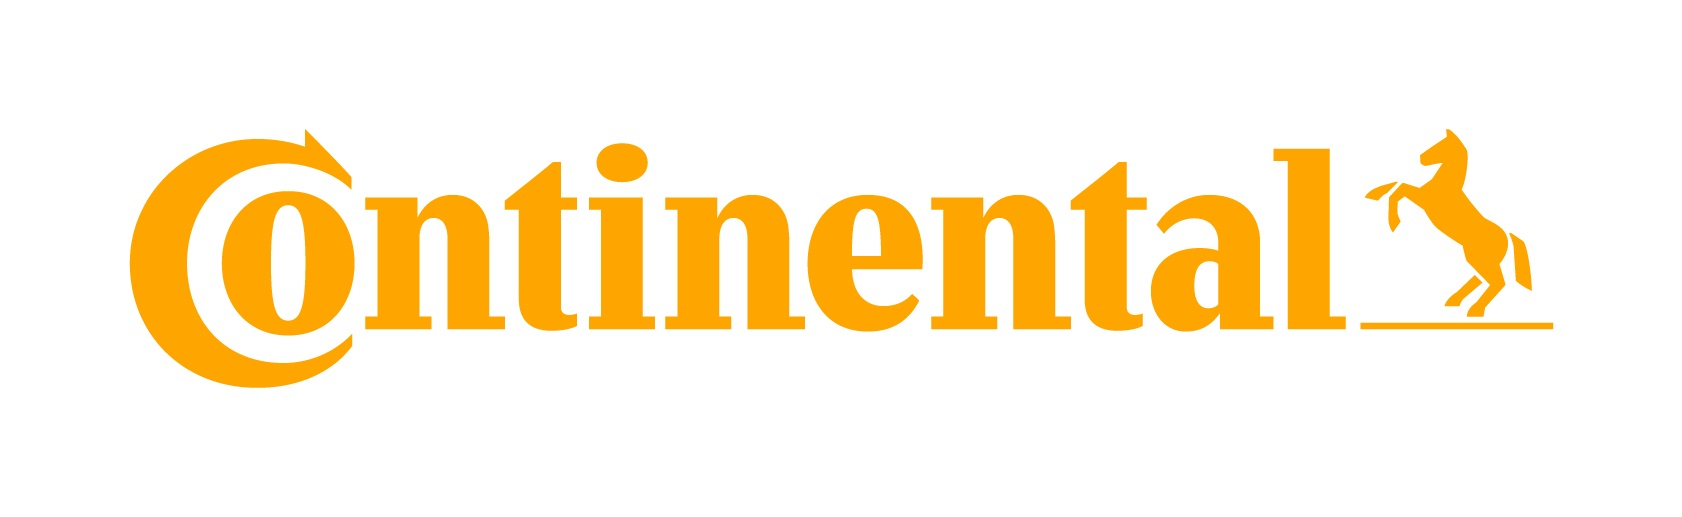 ContinentalMabor - Indústria de Pneus, S.A